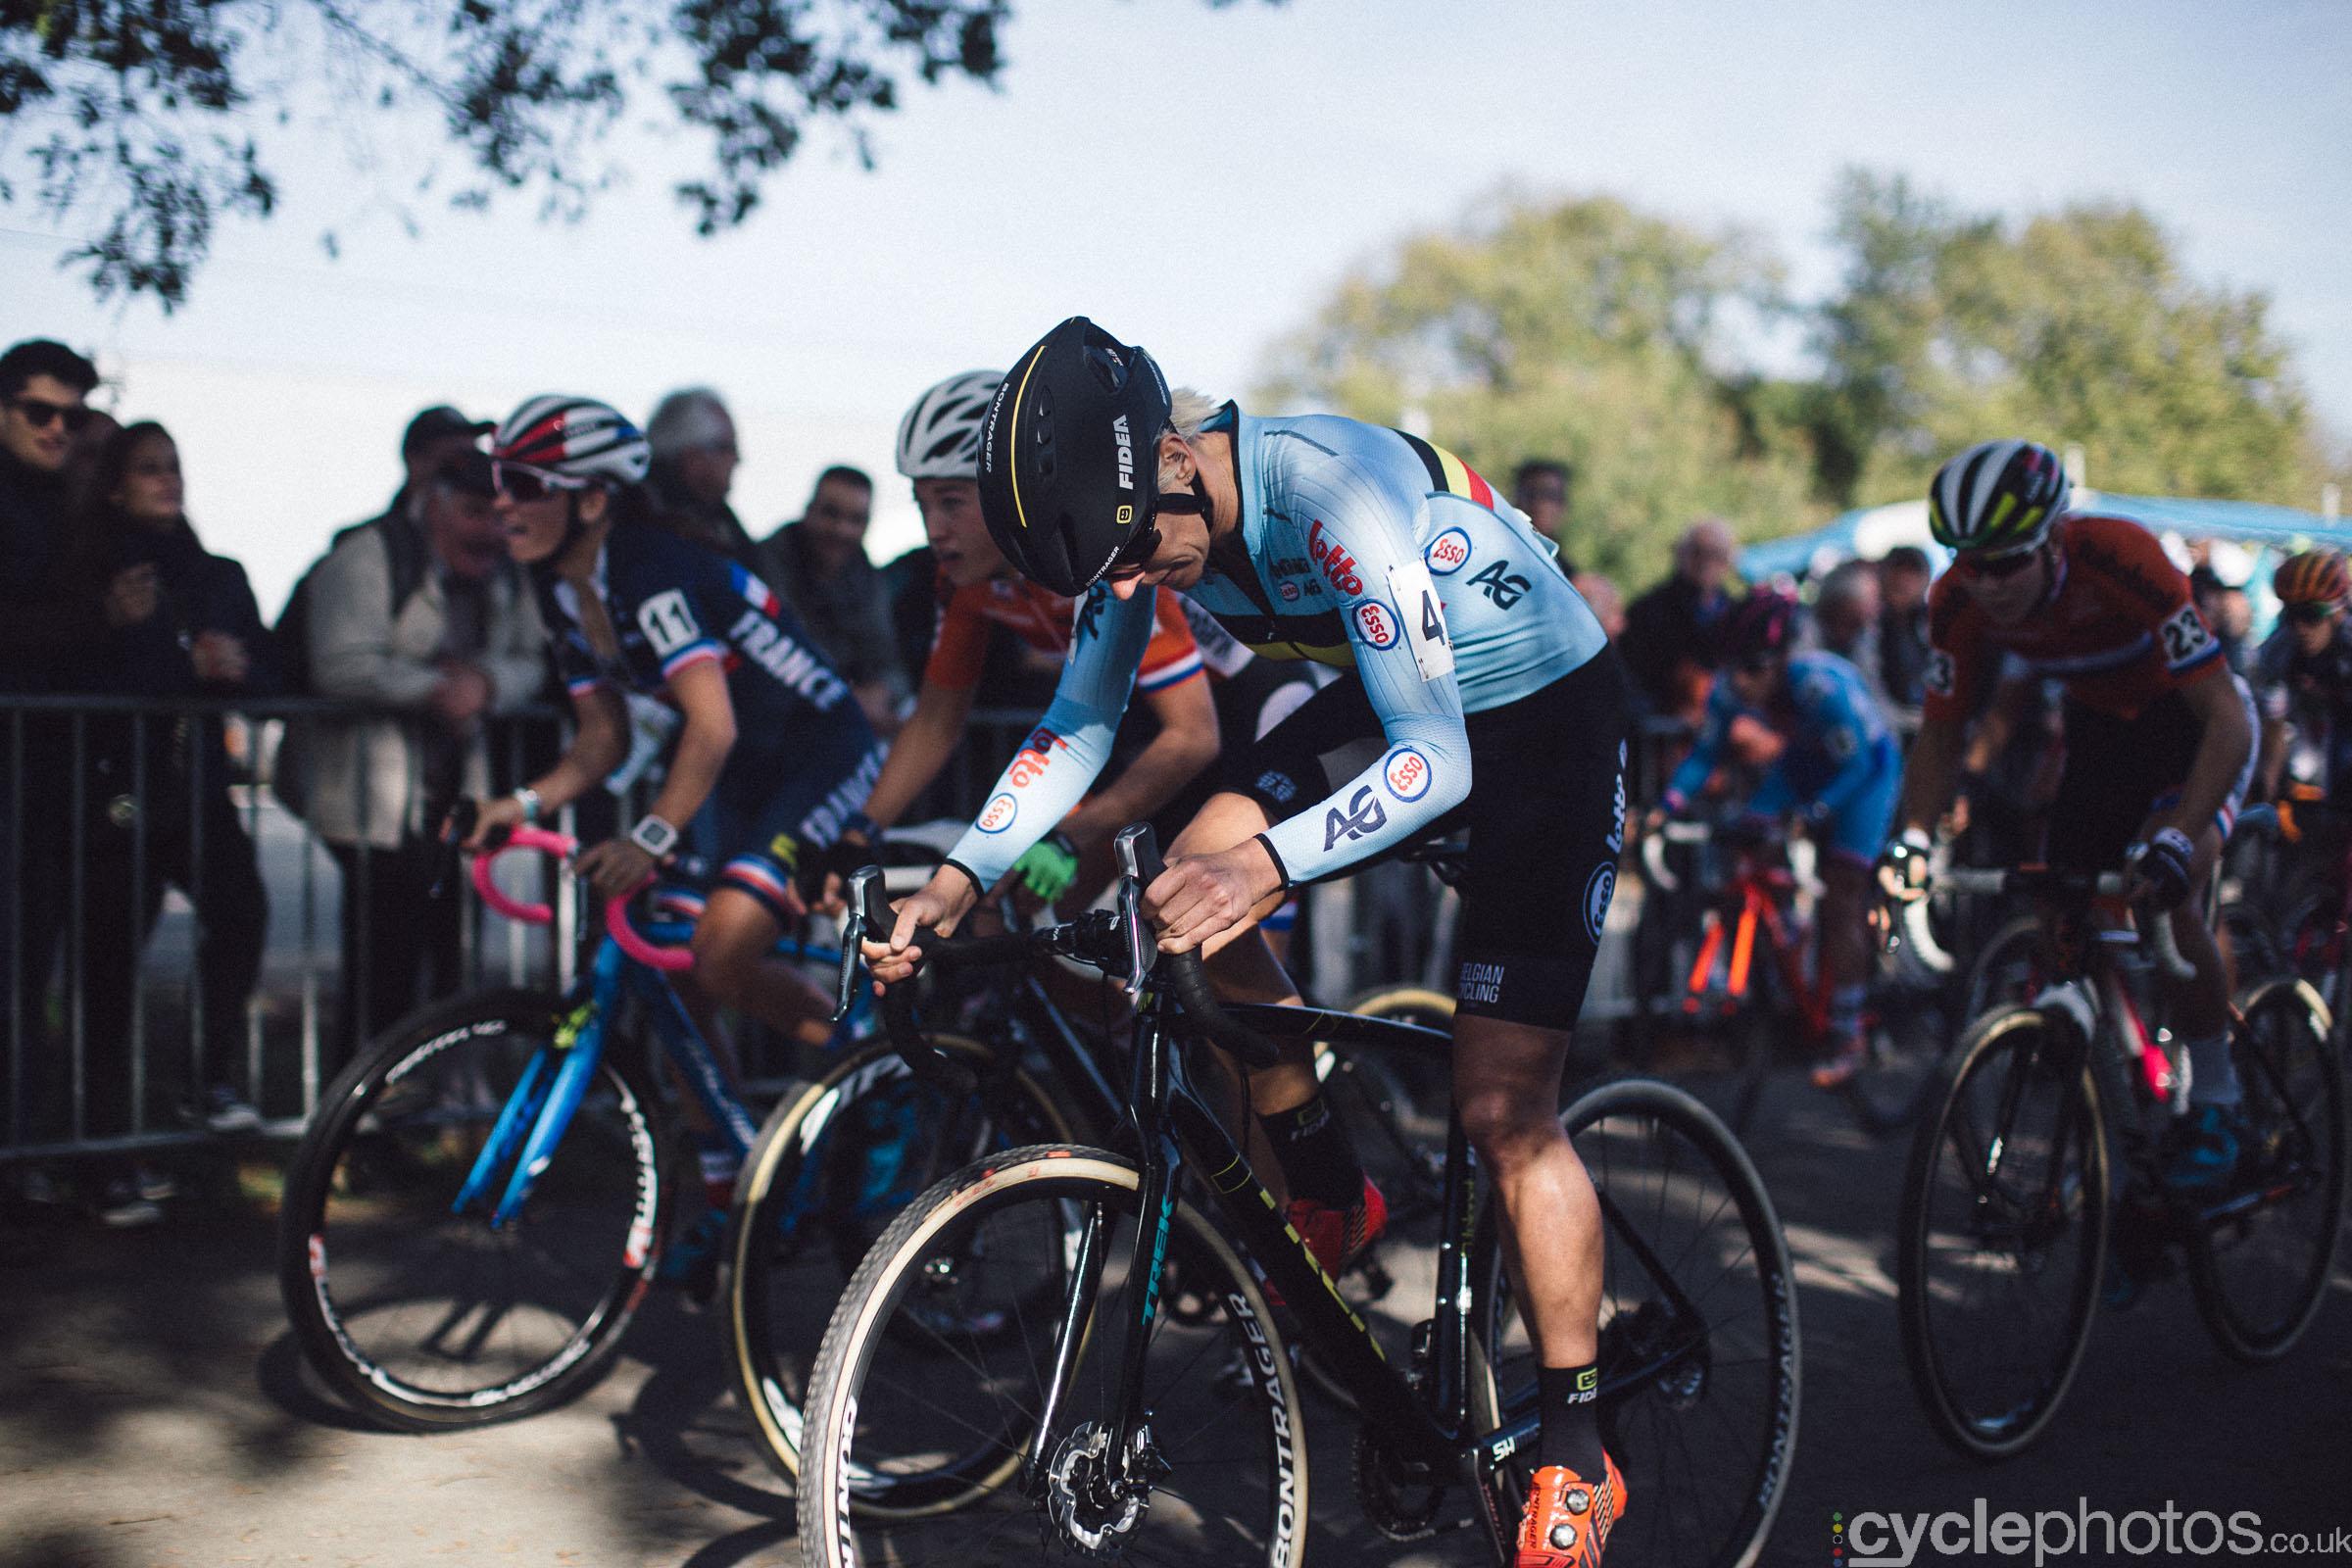 2016 UEC European Cyclocross Chamionships, Pontchatea, France